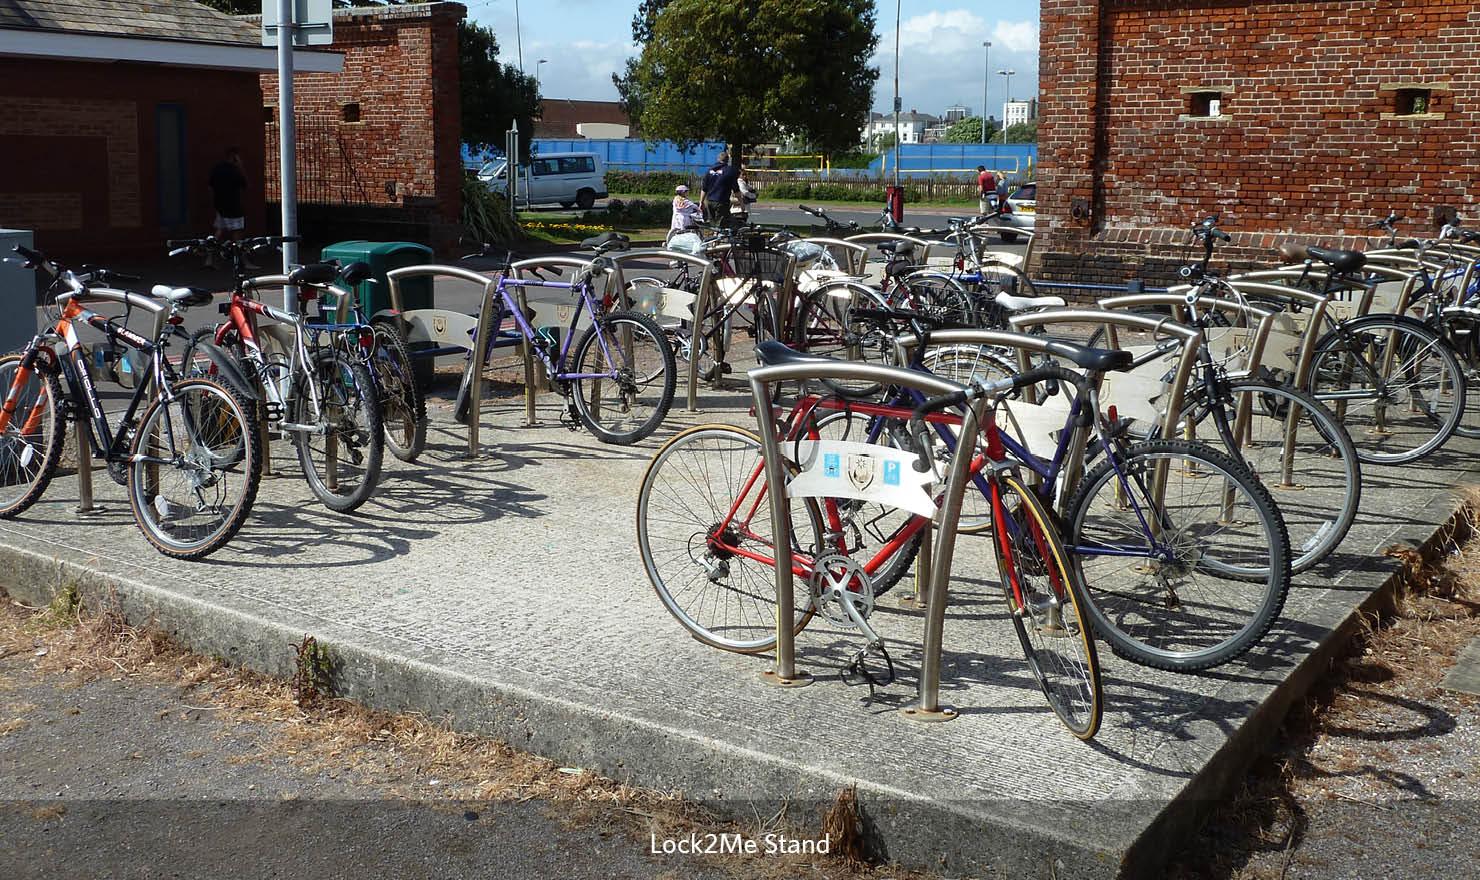 Lock to Me Bike Rack